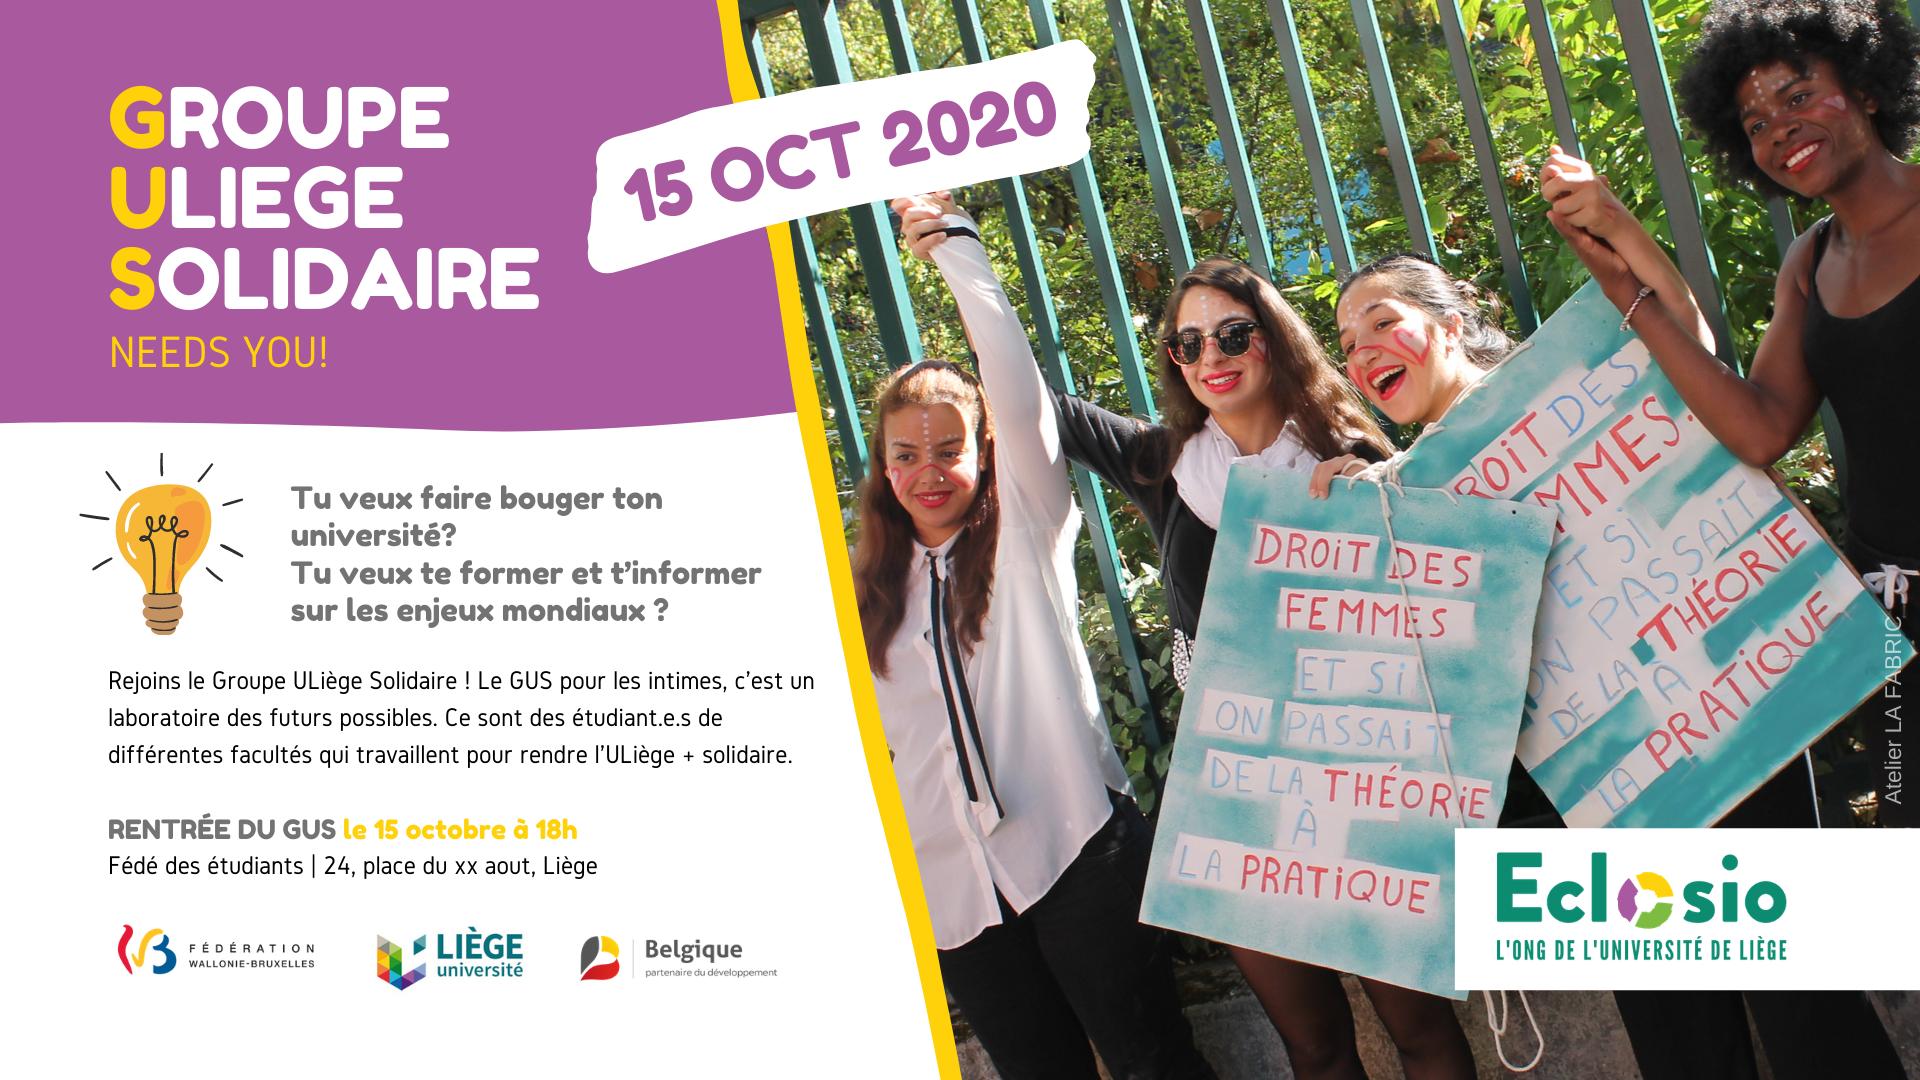 Groupe ULiège Solidaire - rentrée 2020-2021